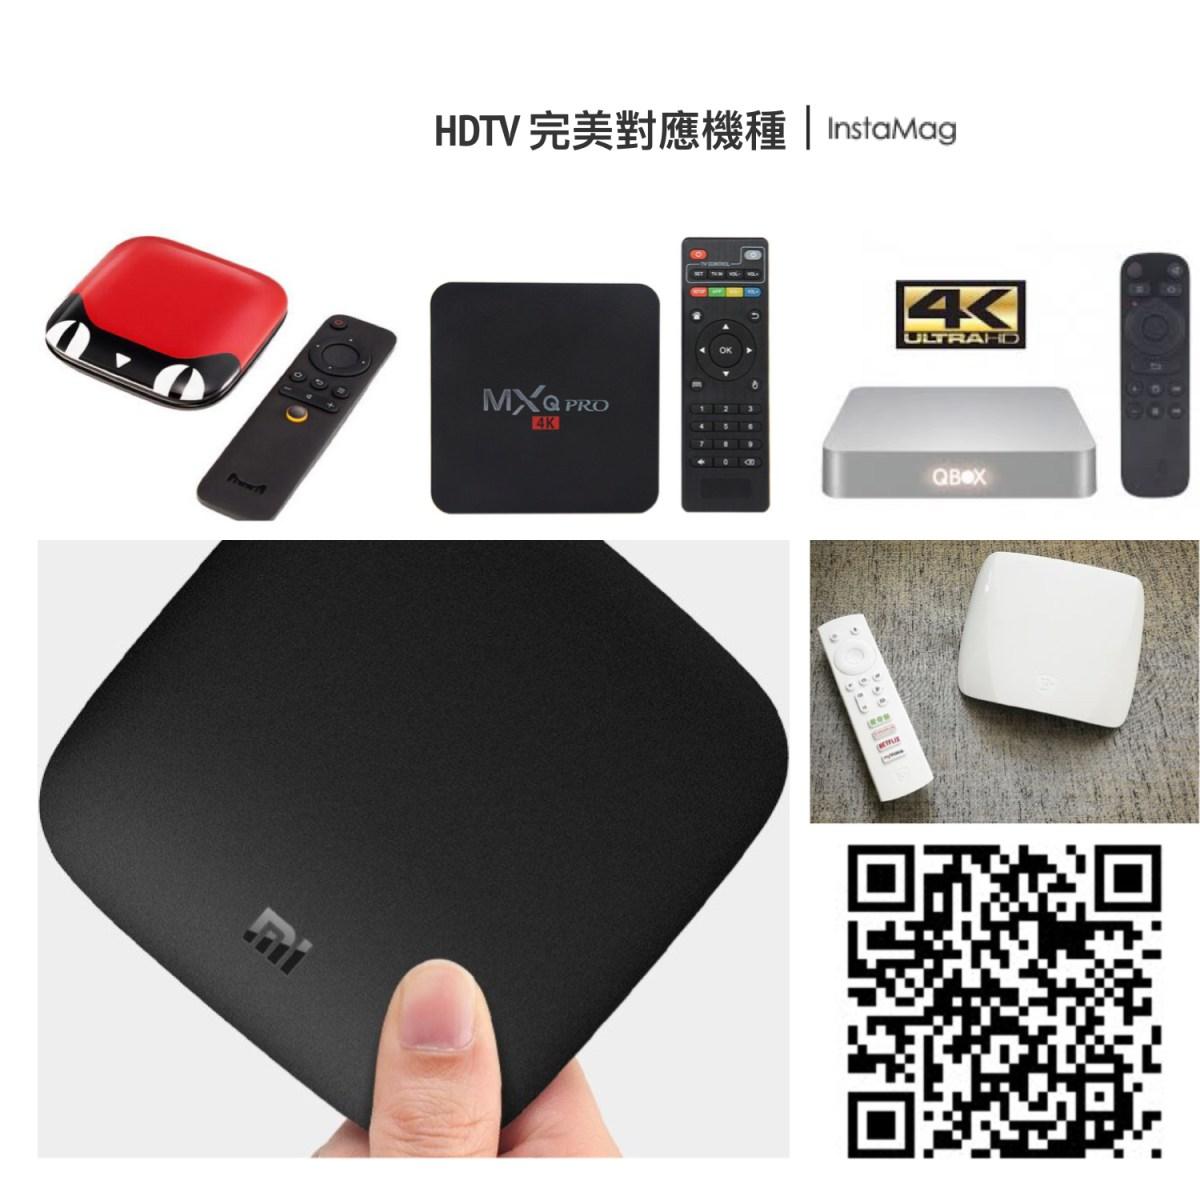 HDTV 高清直播